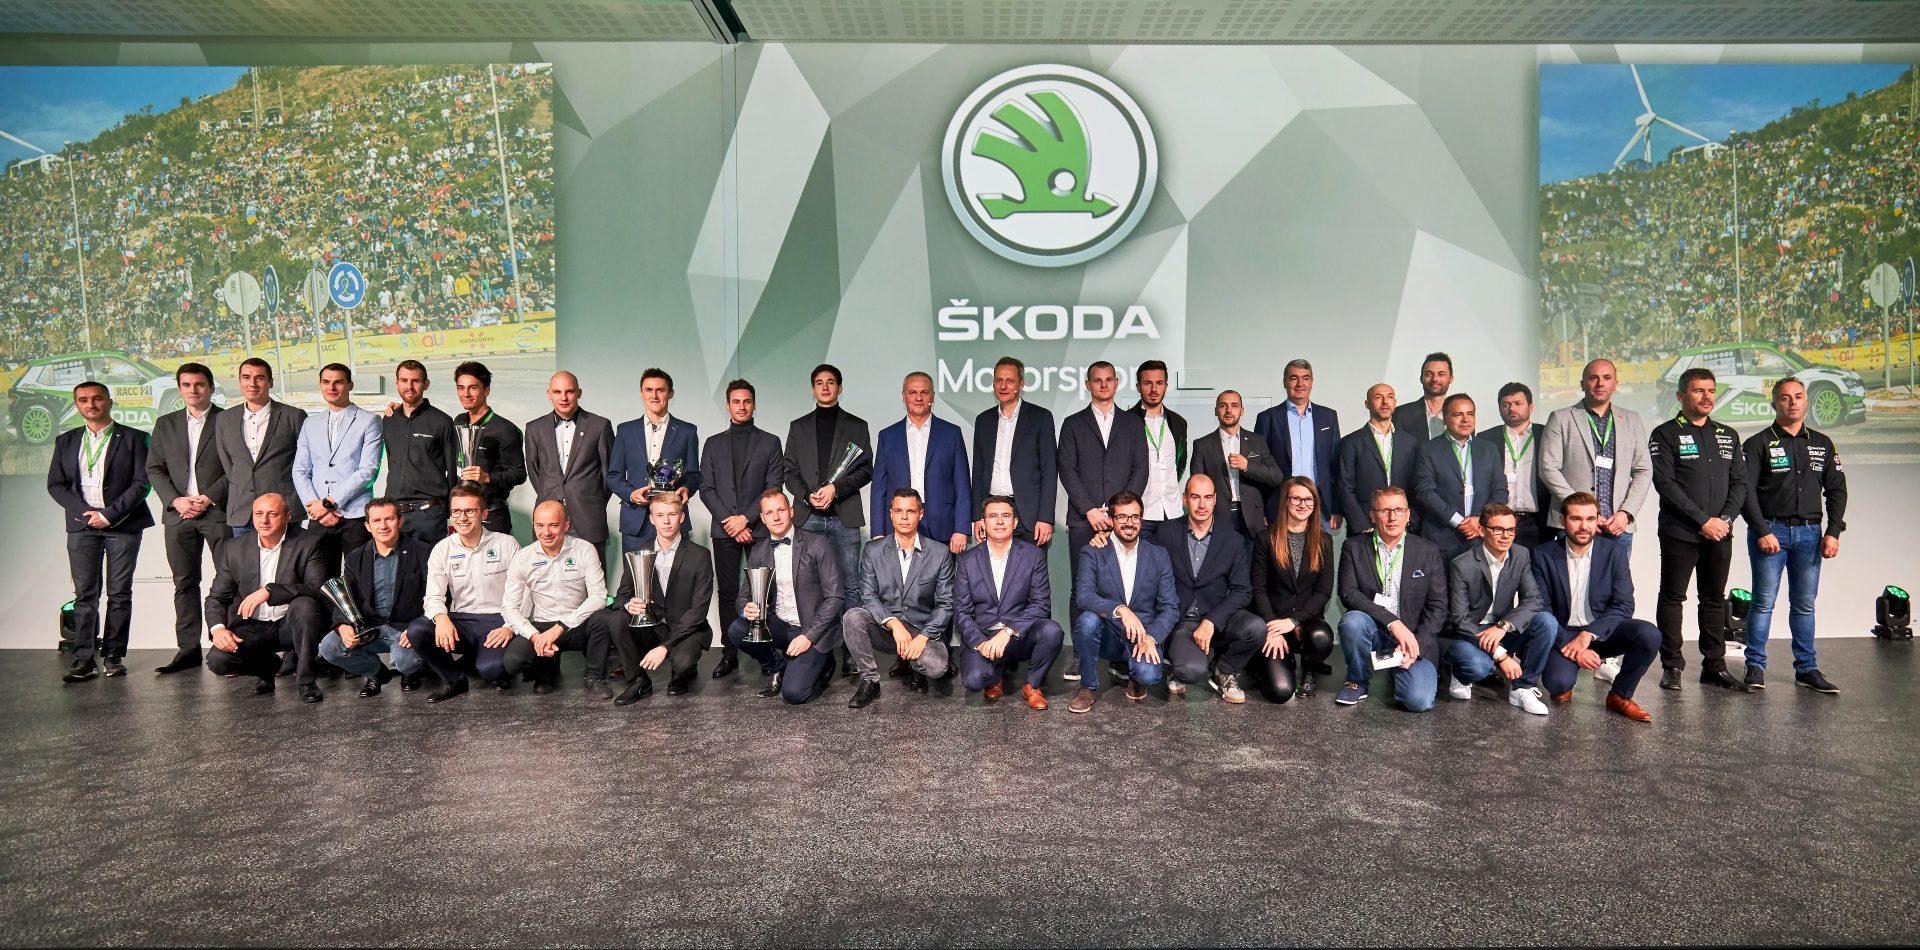 ŠKODA Motorsport celebrates the most successful season ever, winning 30 titles!